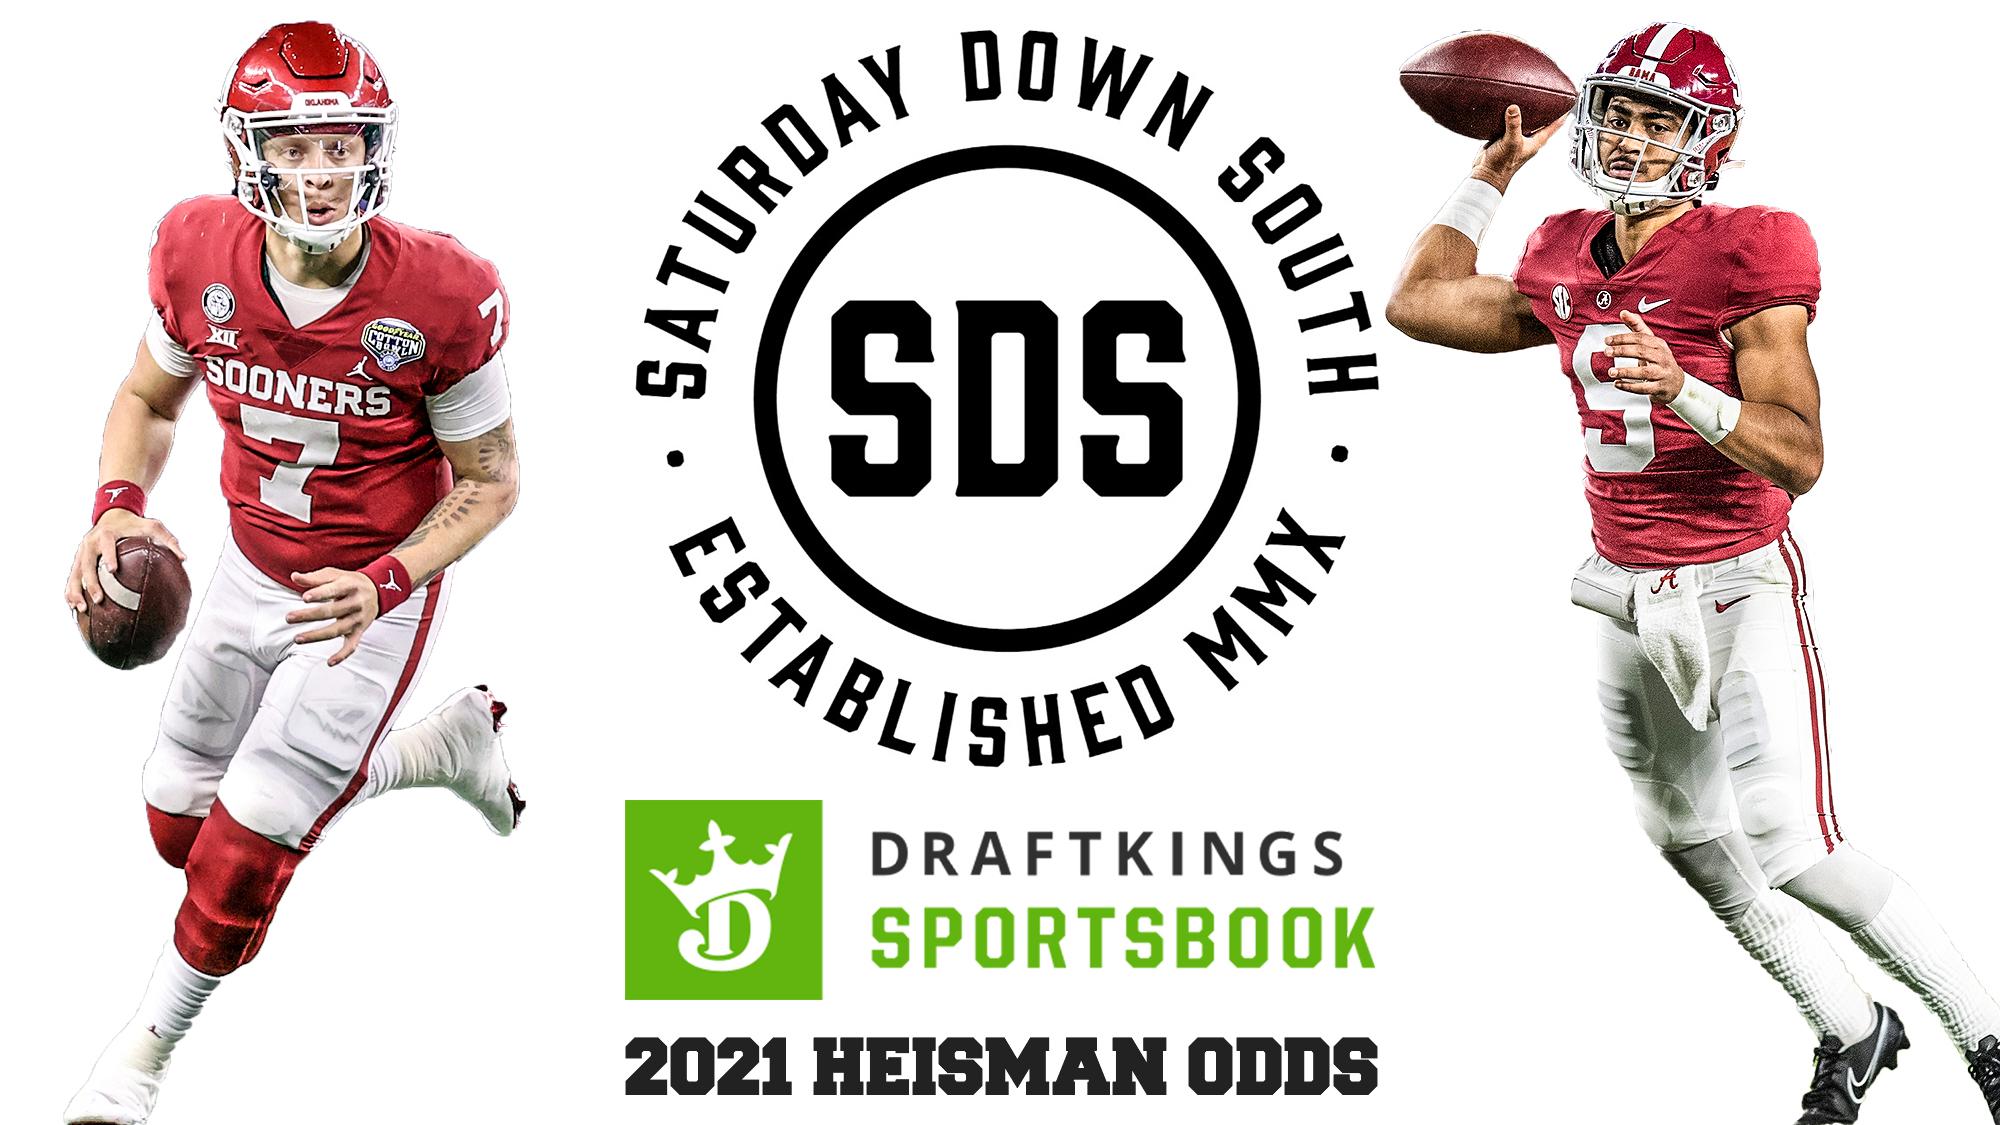 2021 Heisman Odds, Spencer Rattler, Bryce Young